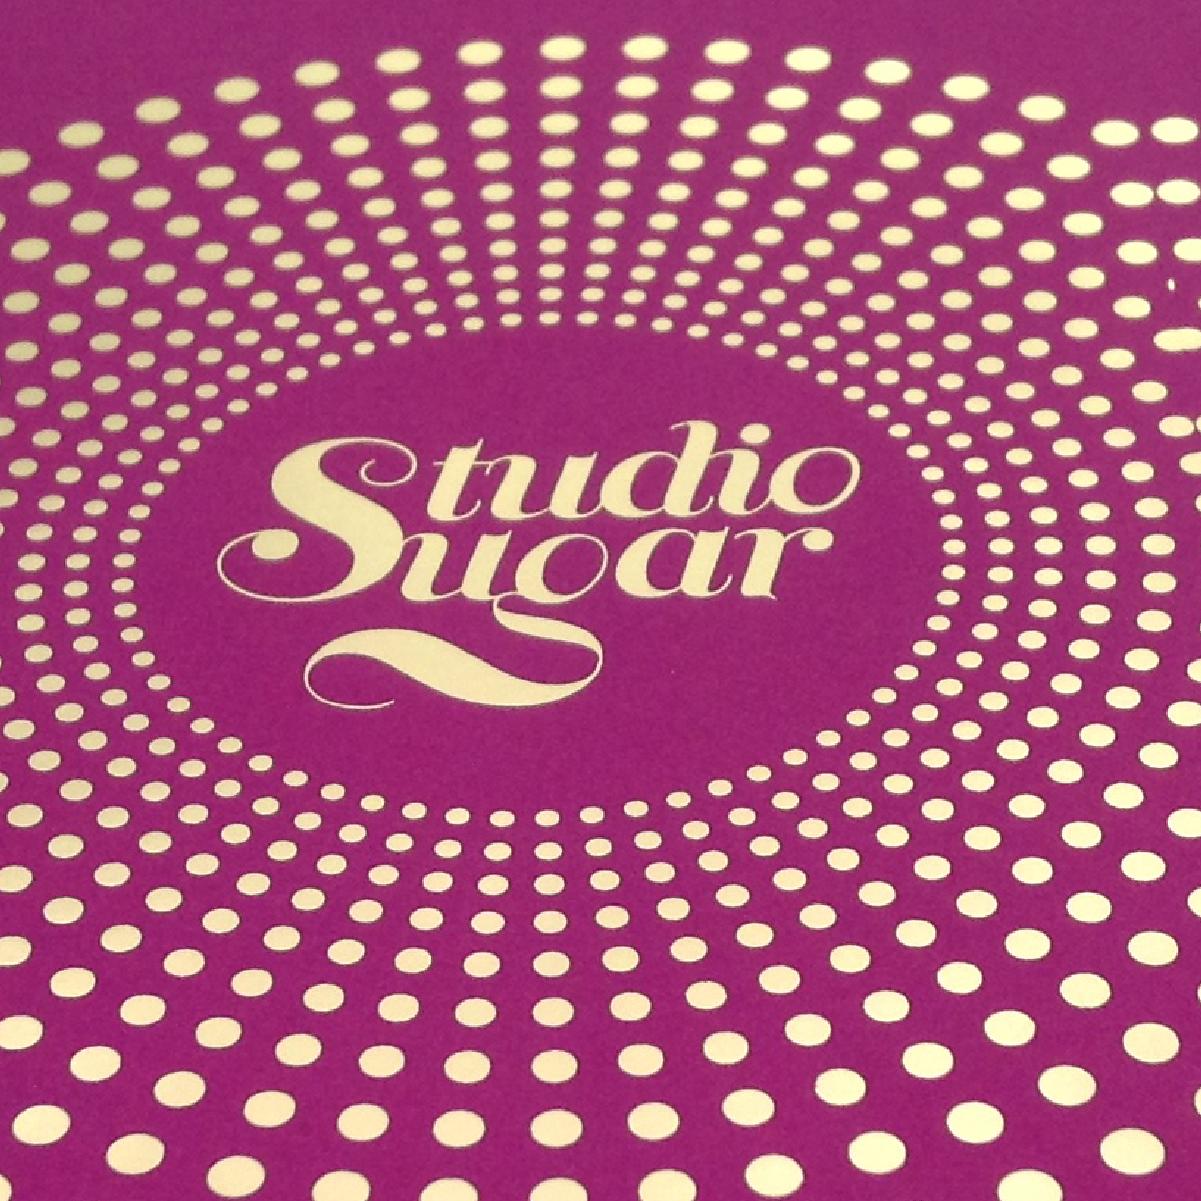 Simeon-Goa_Victoria-Canada_Graphic-Design_Illustration-Studio-Sugar_Image.jpg